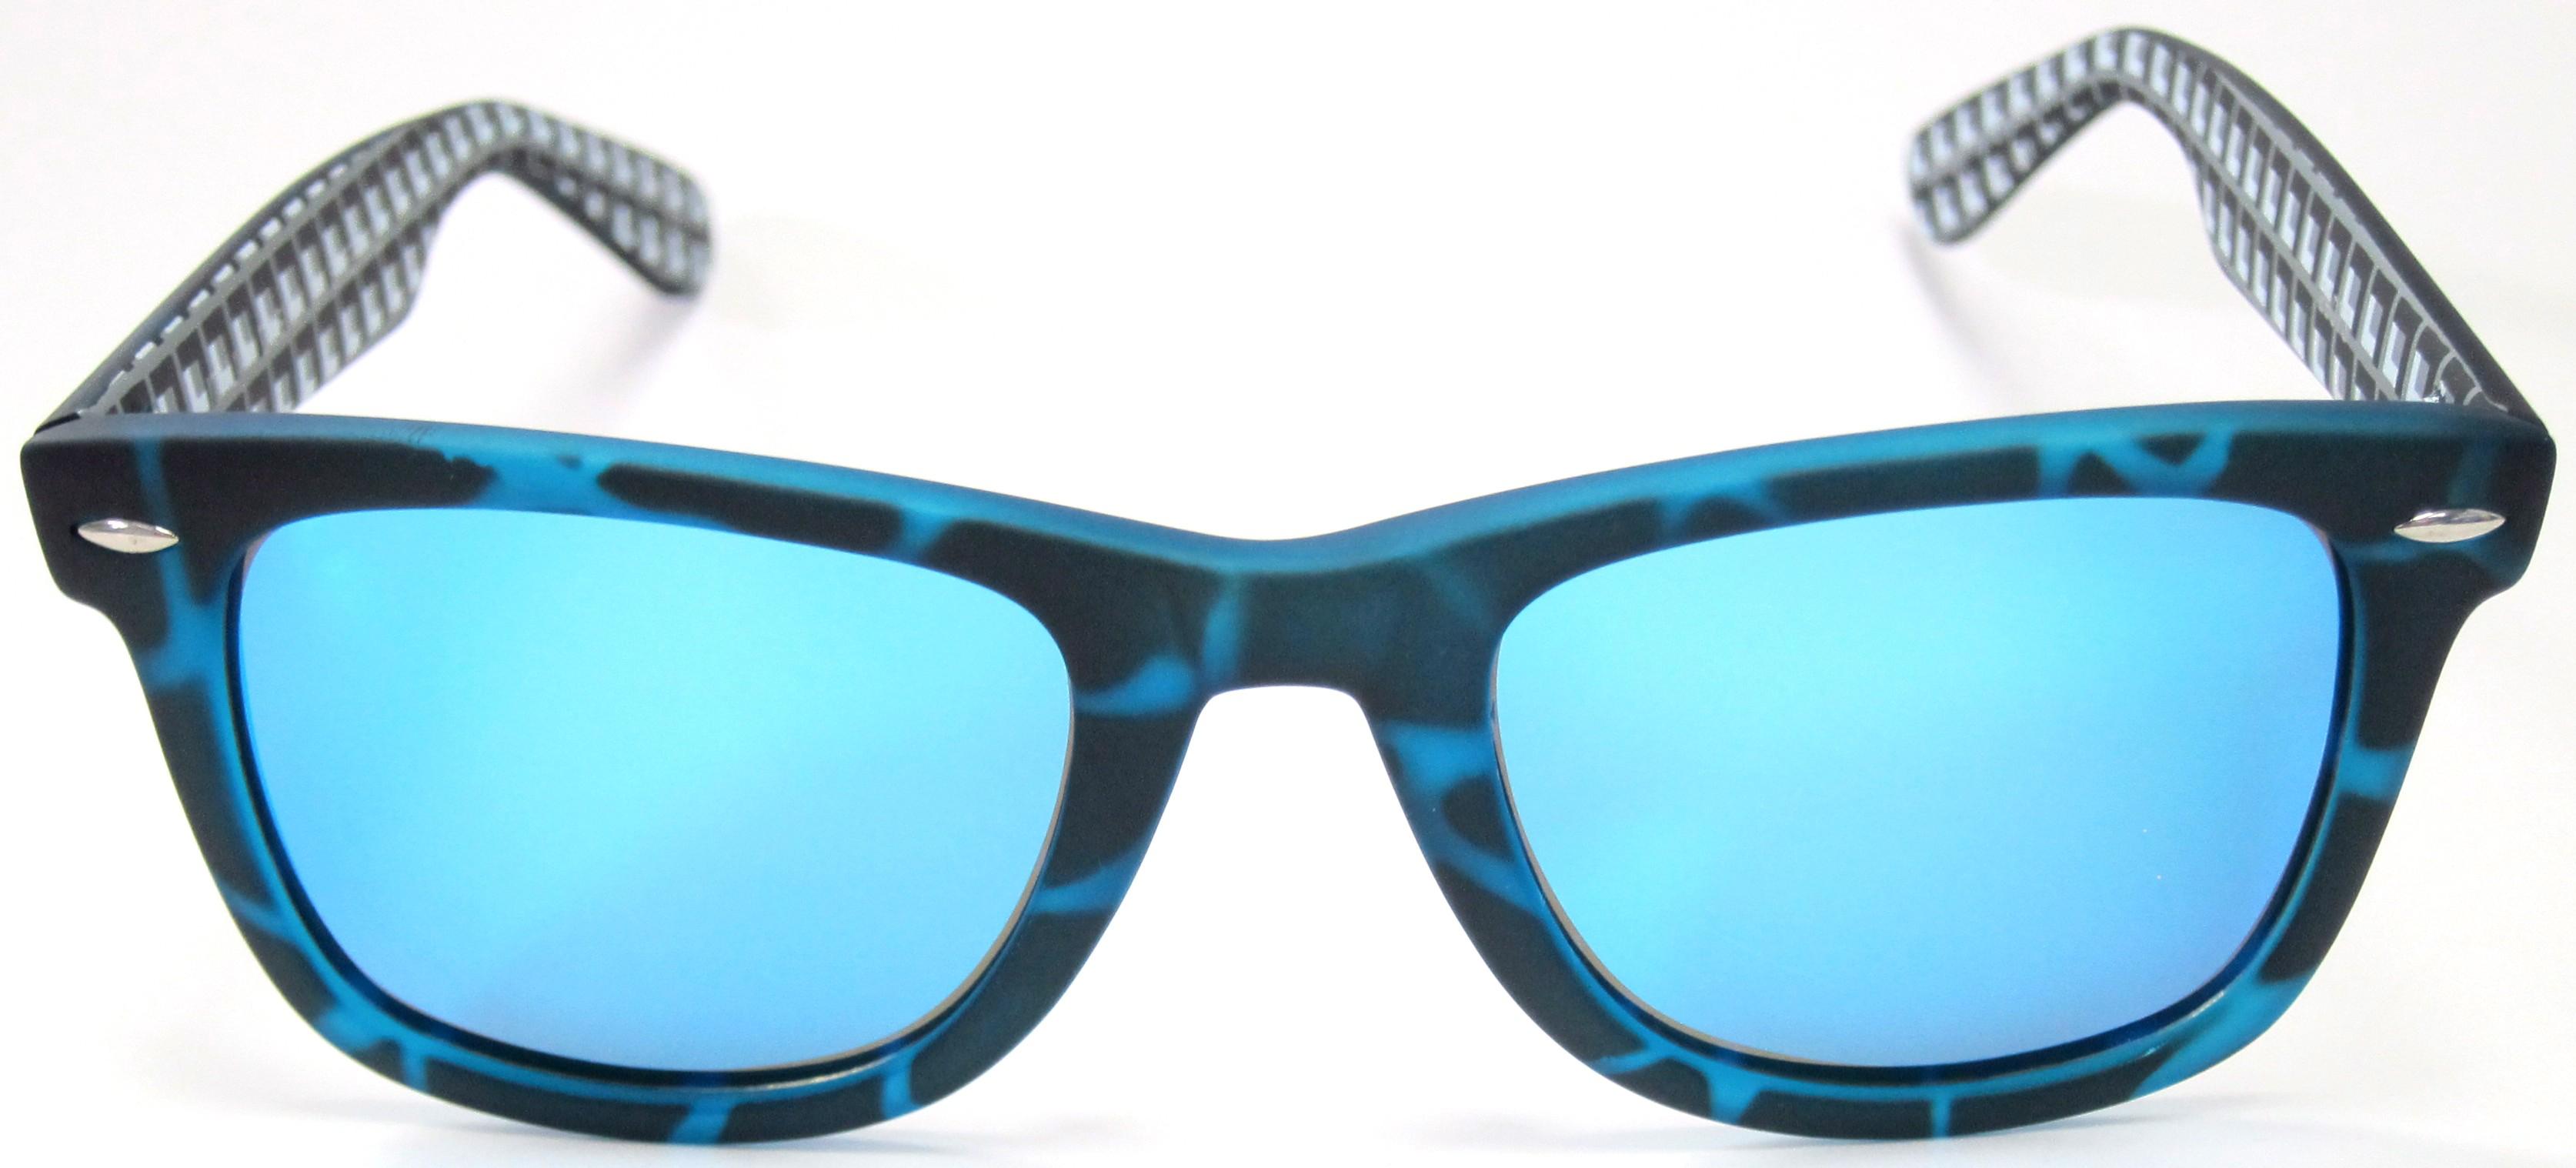 29073-2 C5 -Blue Revo